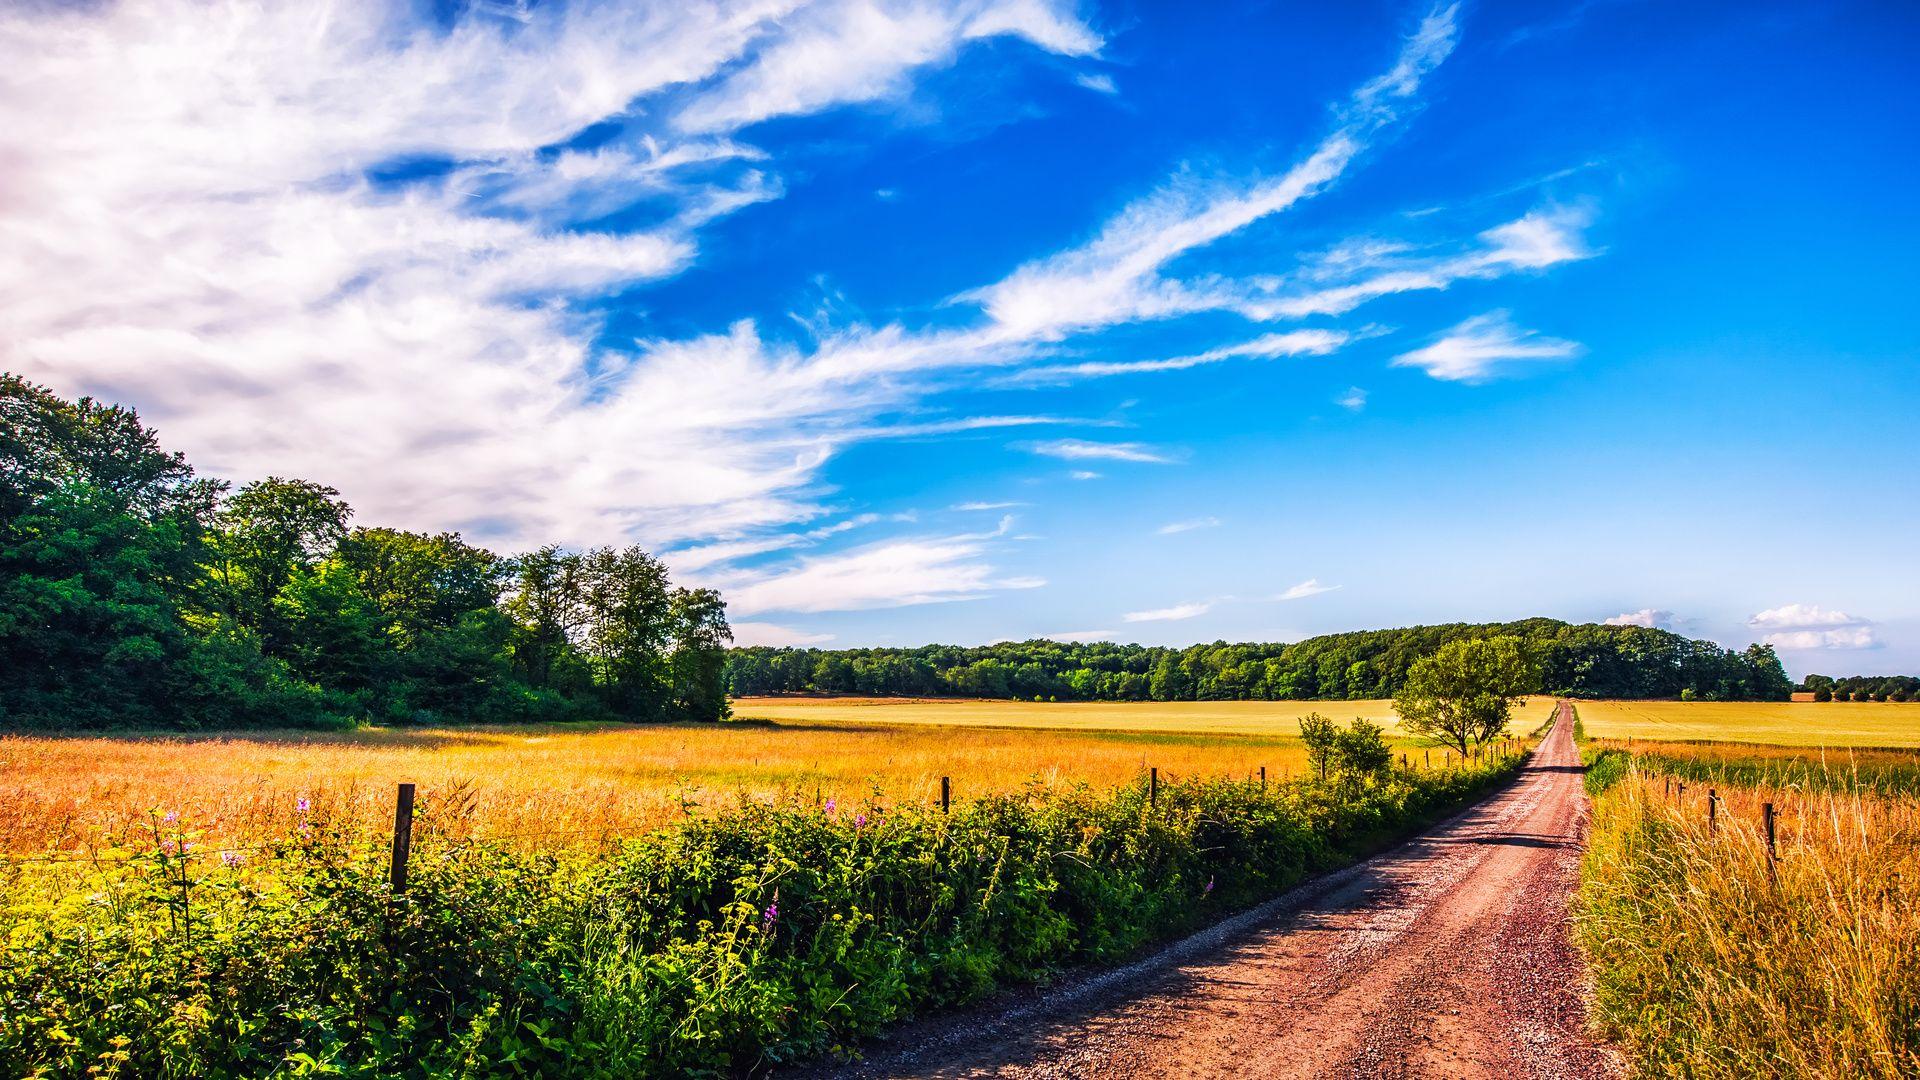 Landscape Summer Pictures